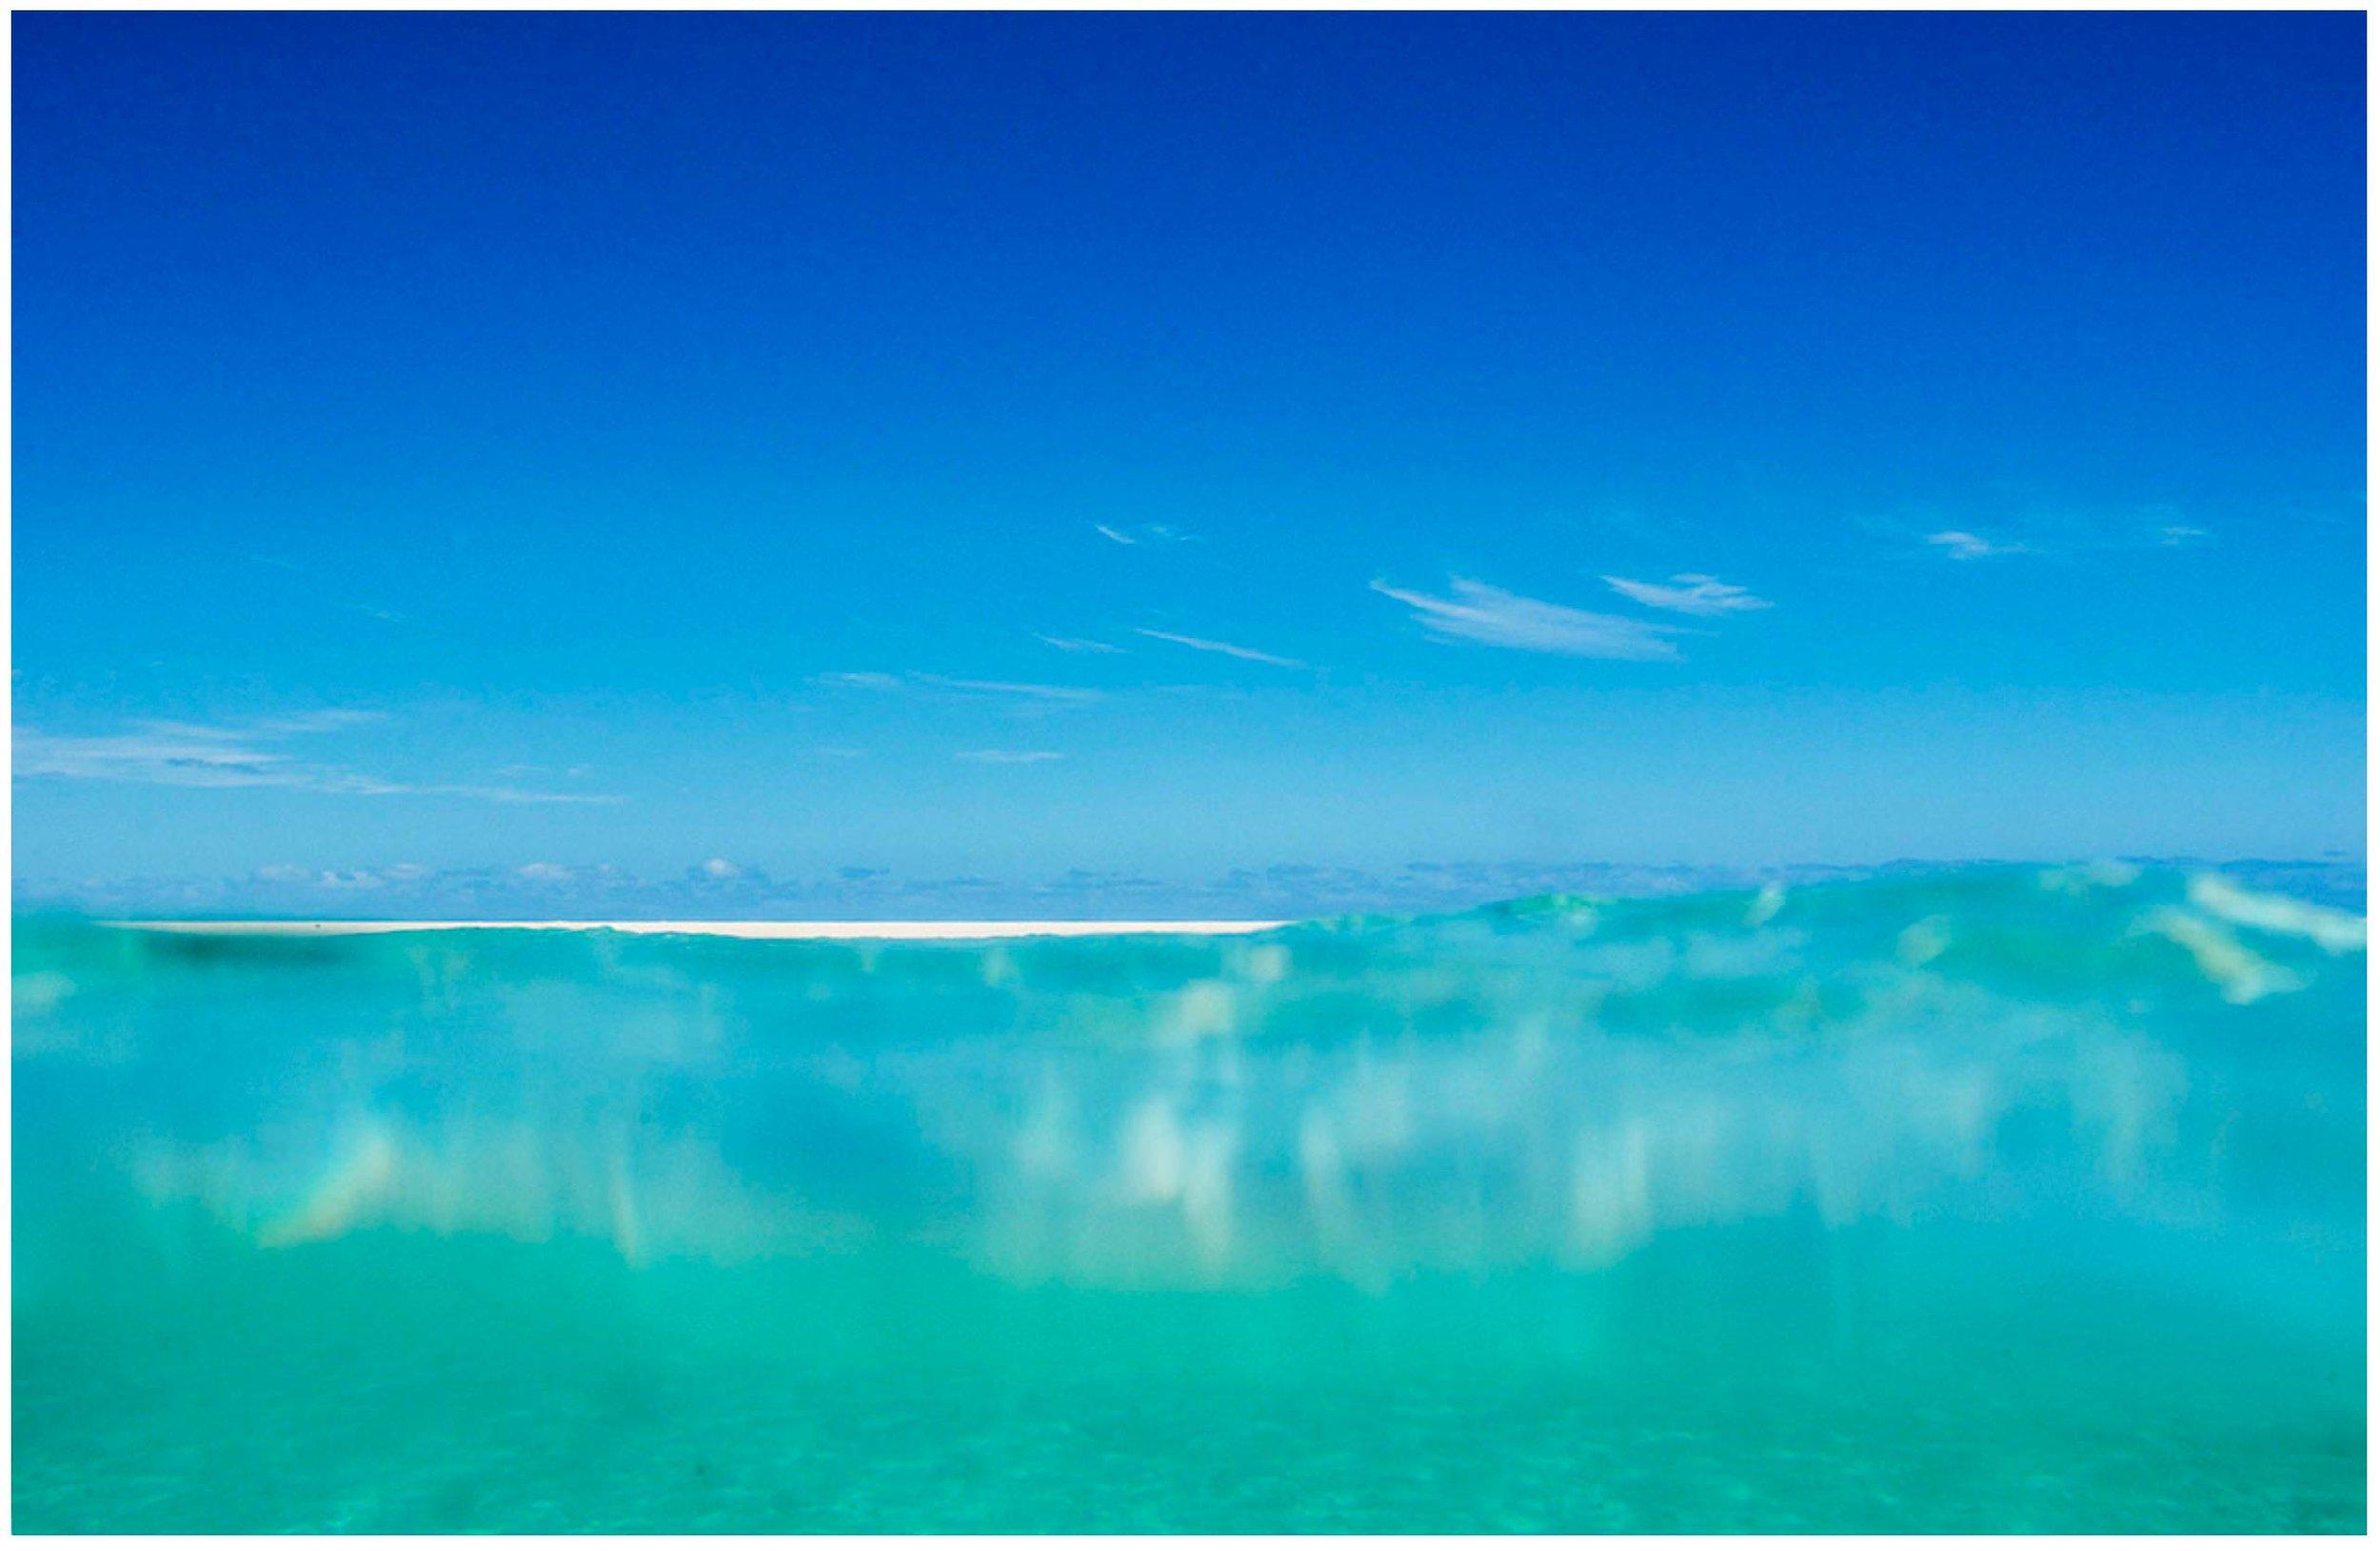 rodd-owen-ocean-surf-photography-for-sale-132.jpg